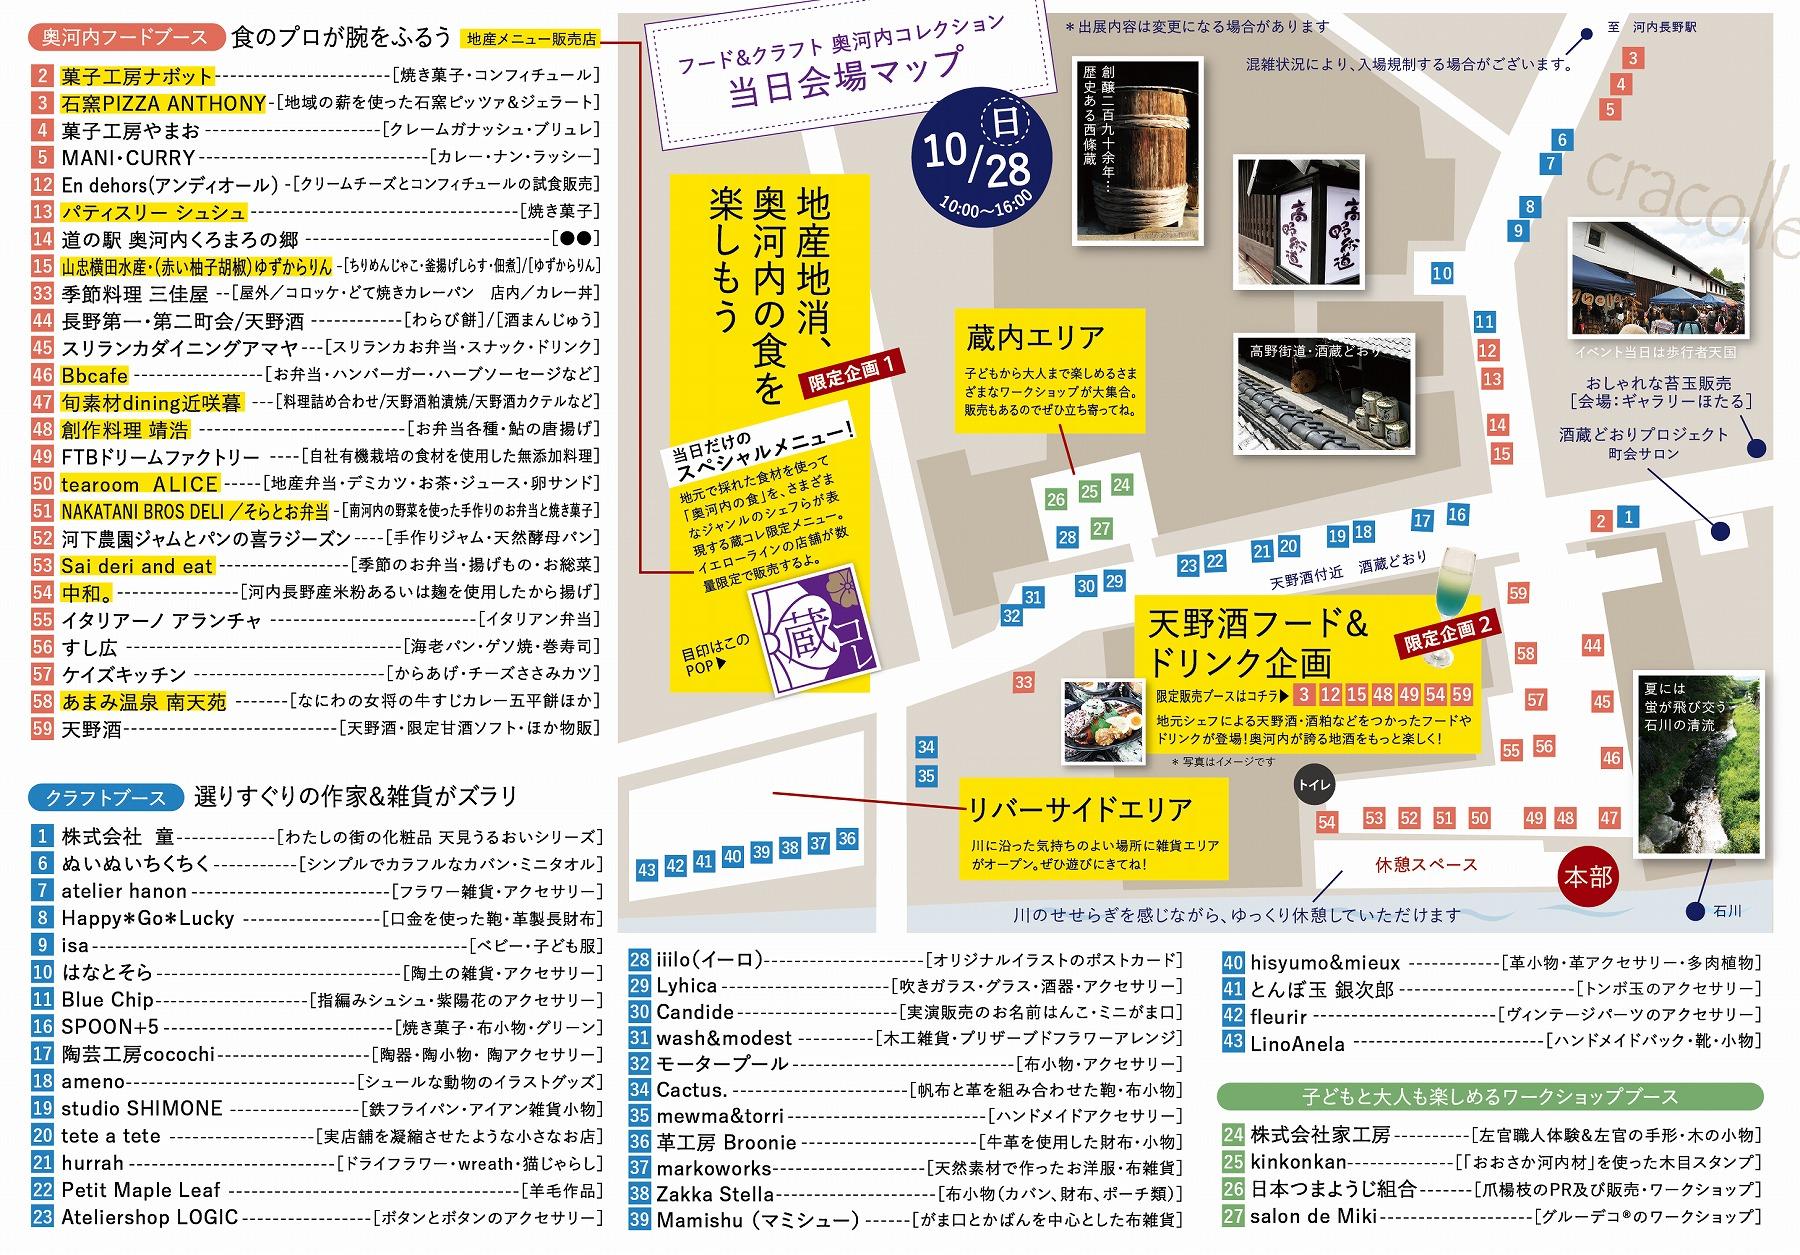 map_20180927133839e2b.jpg